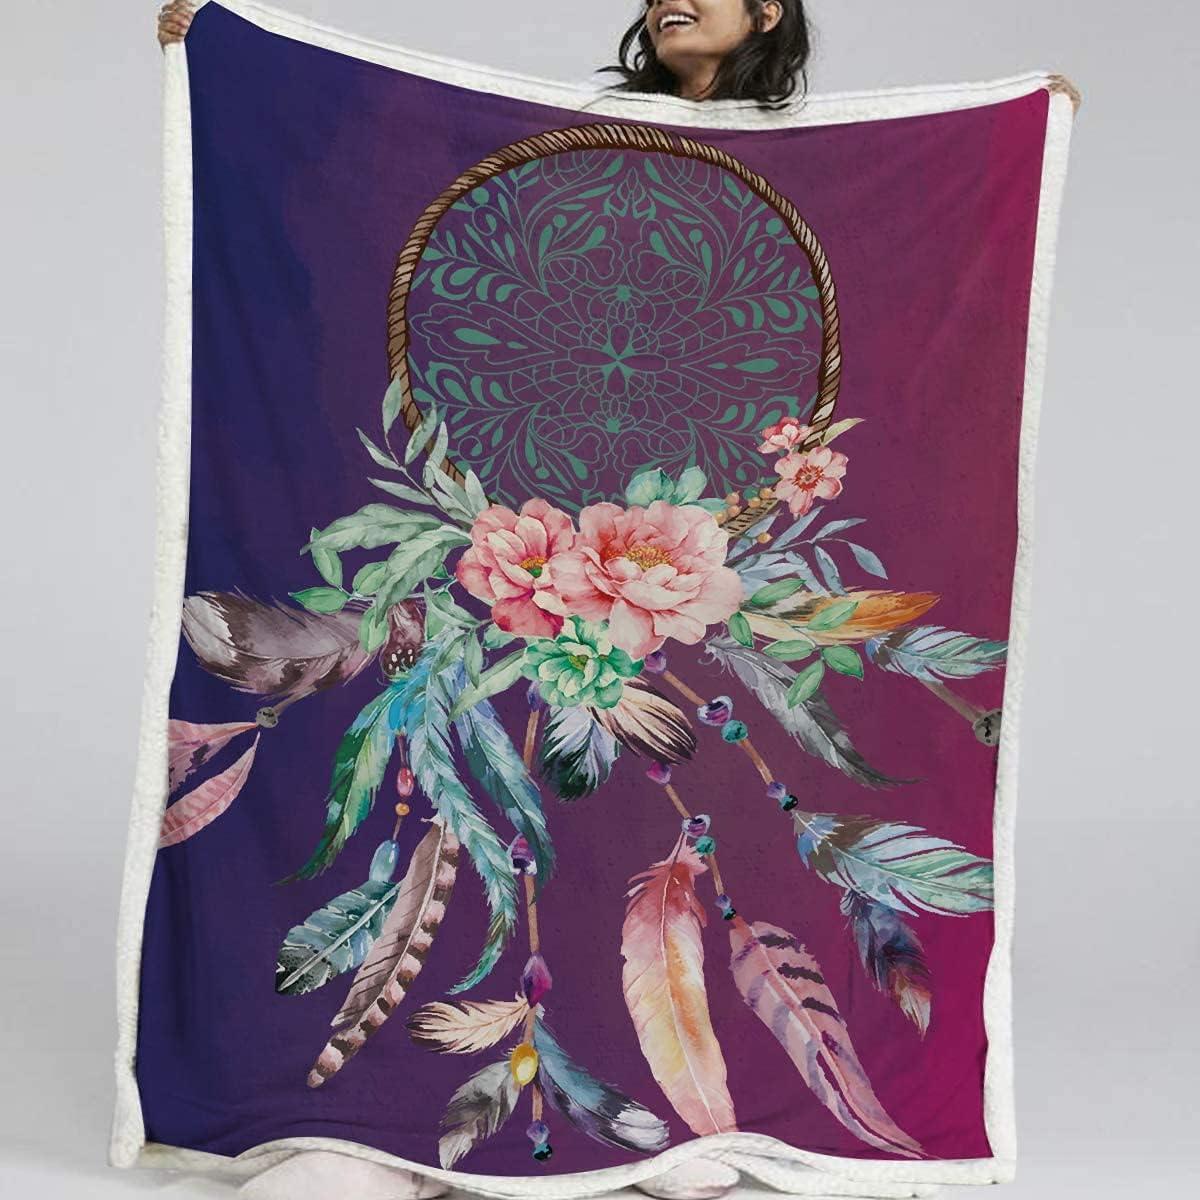 BlessLiving Super sale period limited Dream Catcher Blanket Flannel Reversib Sherpa Max 53% OFF Fleece